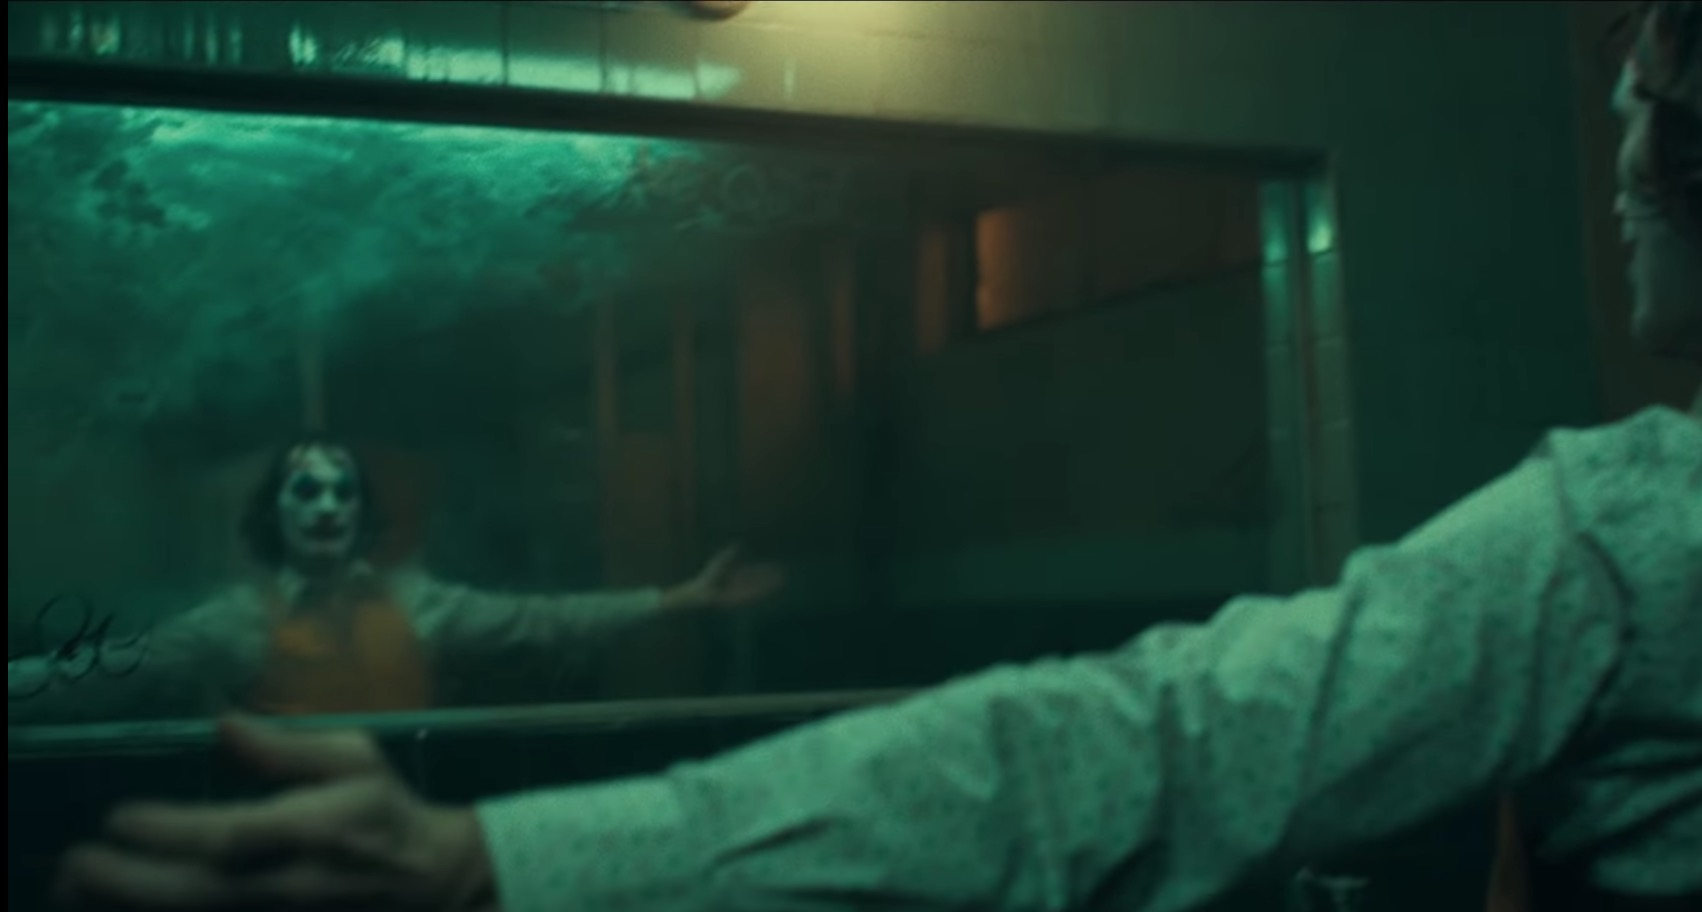 Joker-Warner Bros-DC-Teaser Trailer